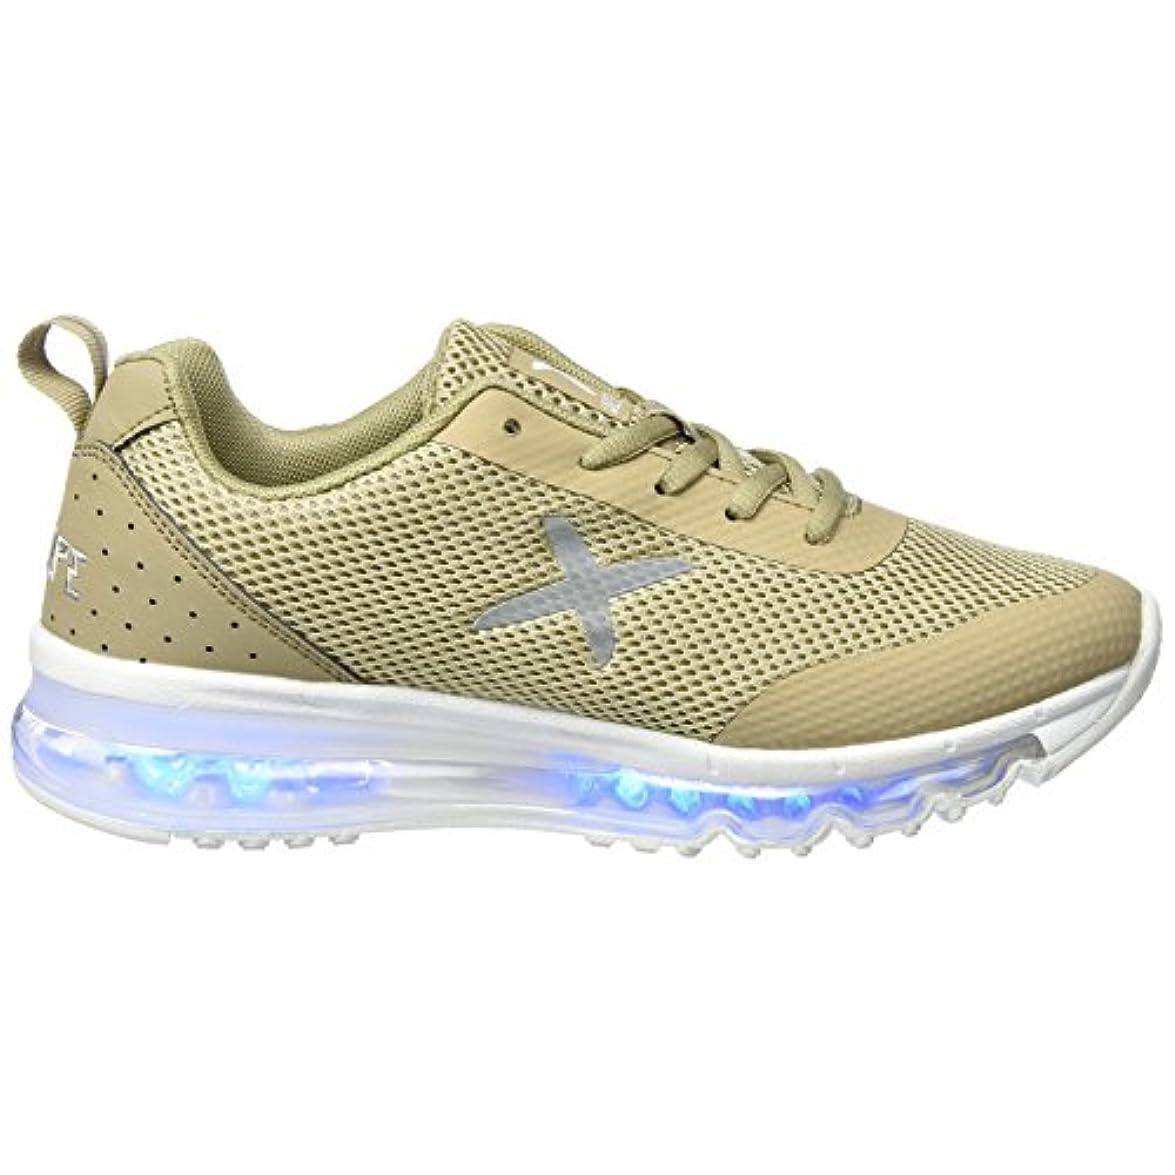 Wize amp; Ope Xrun-12 Sneaker Basse Unisex - Adulto